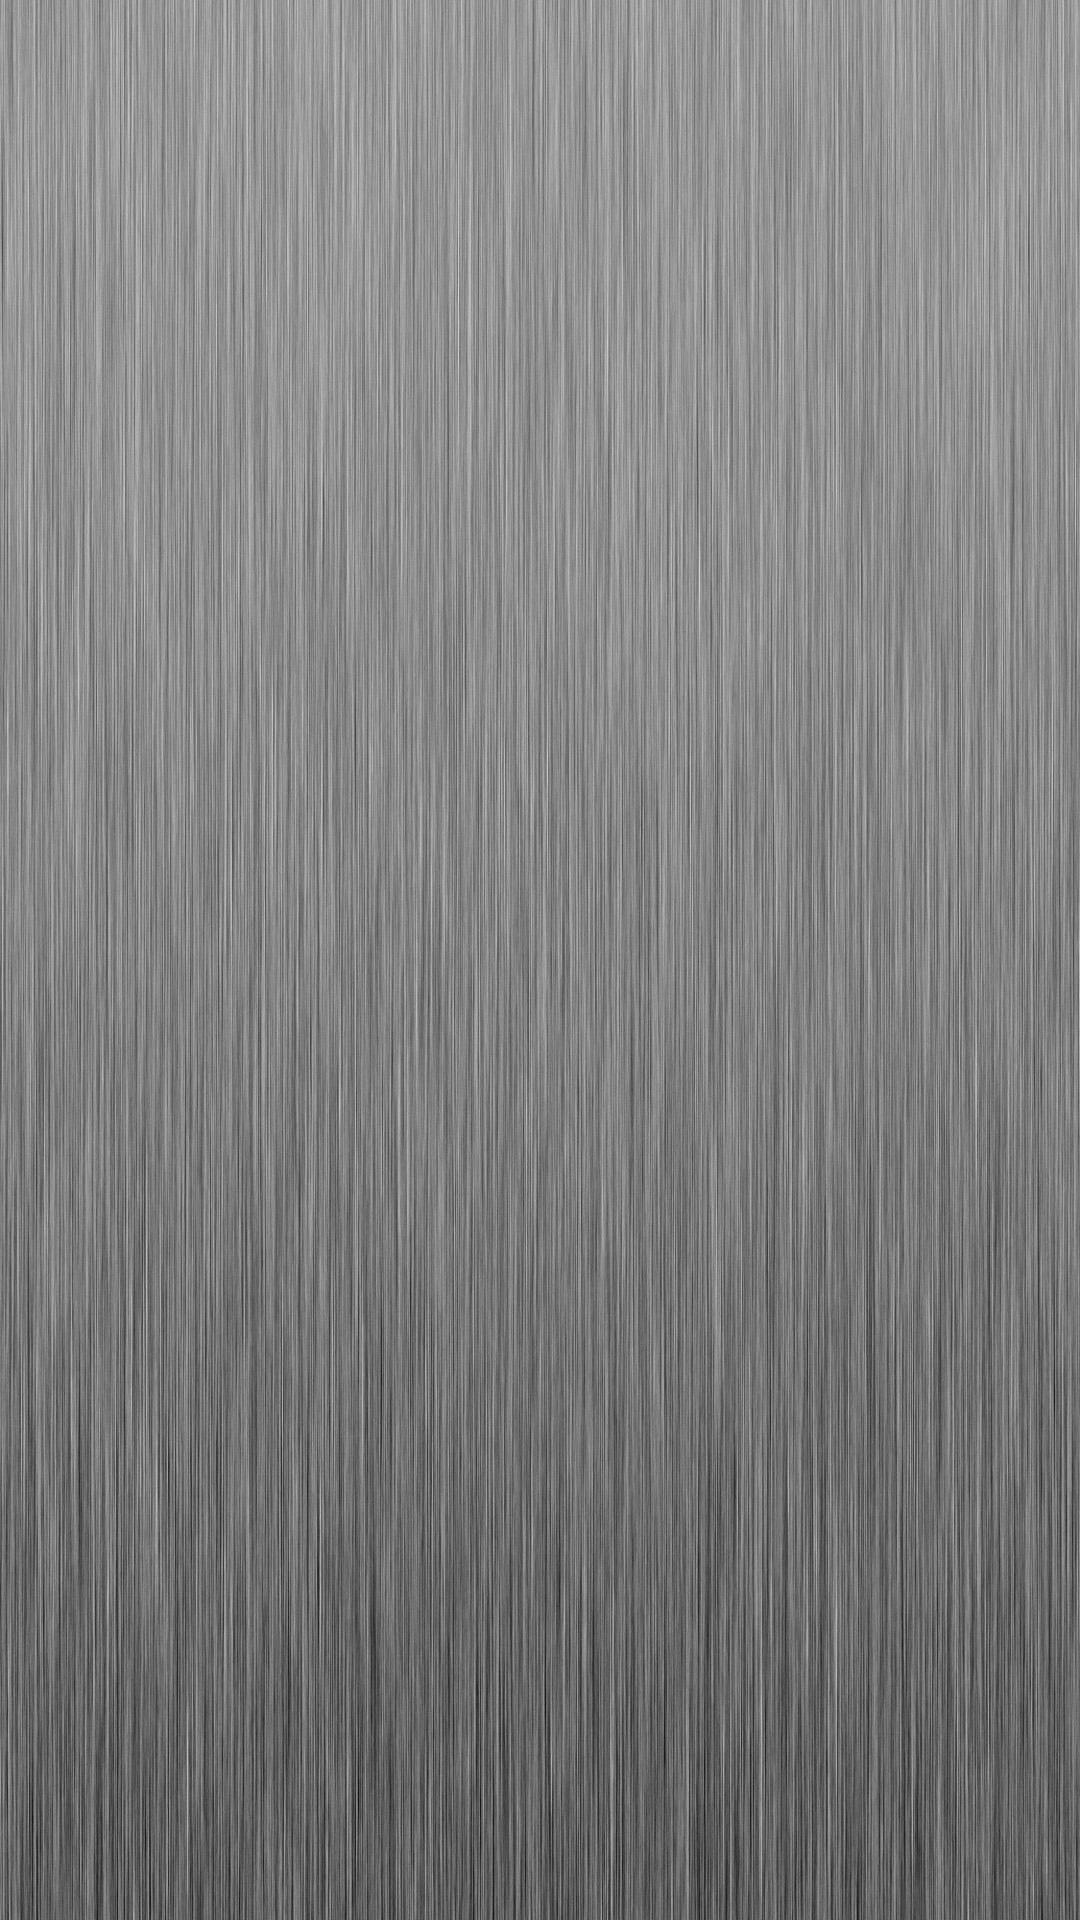 change home screen wallpaper iphone 6